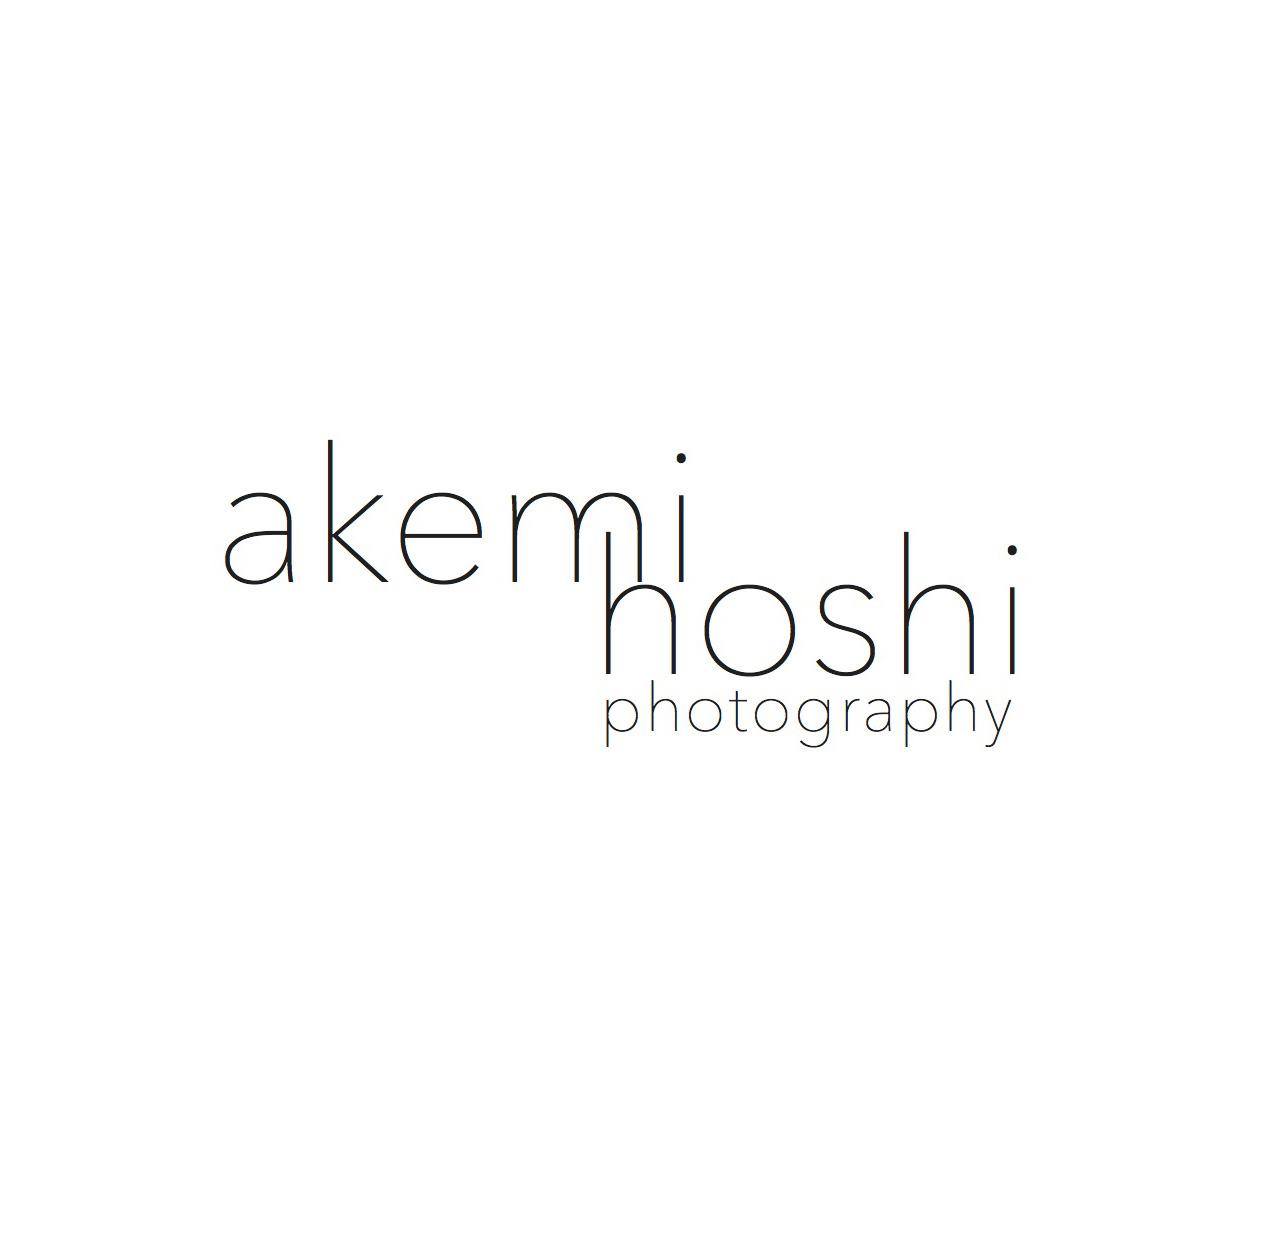 Akemi Hoshi photography logo.jpg